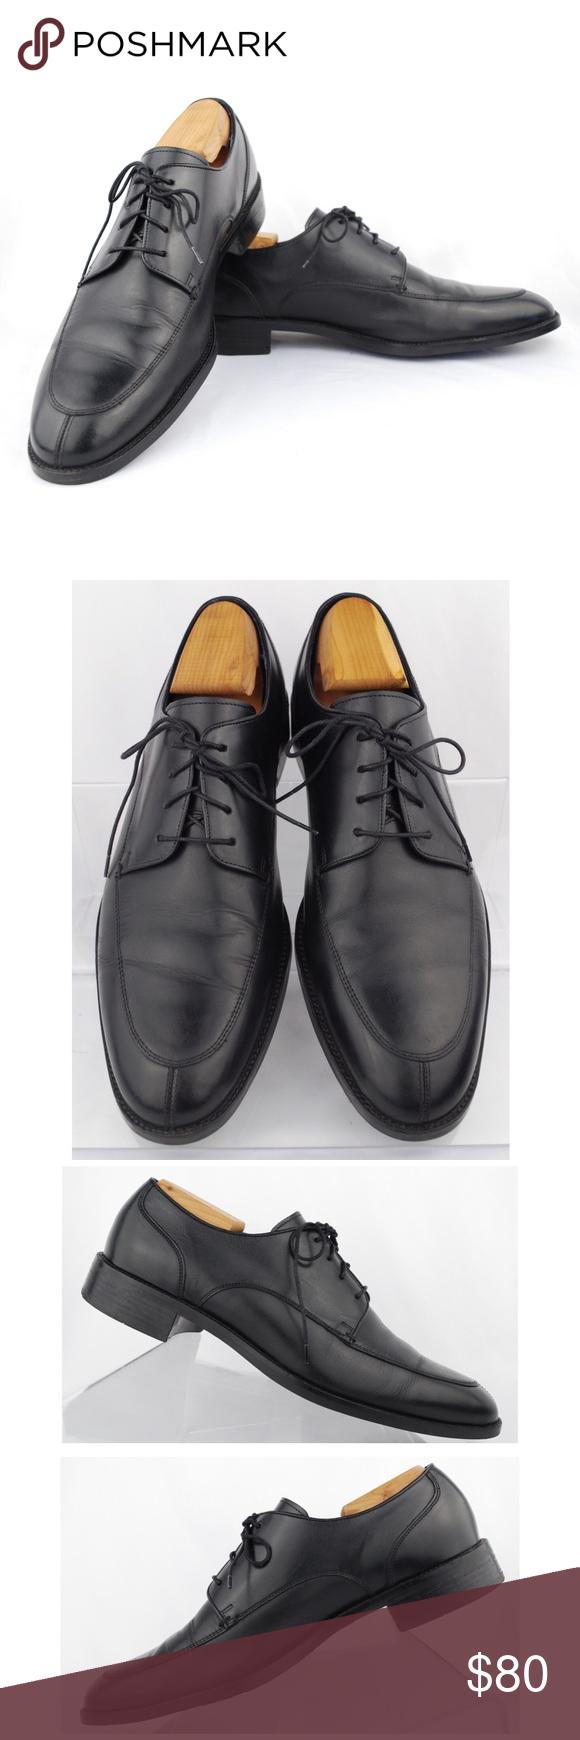 Cole Haan Men s Black Leather Split-Toe Oxfords Cole Haan C11627 Men s Black  Leather Split ac6d69b6bc2